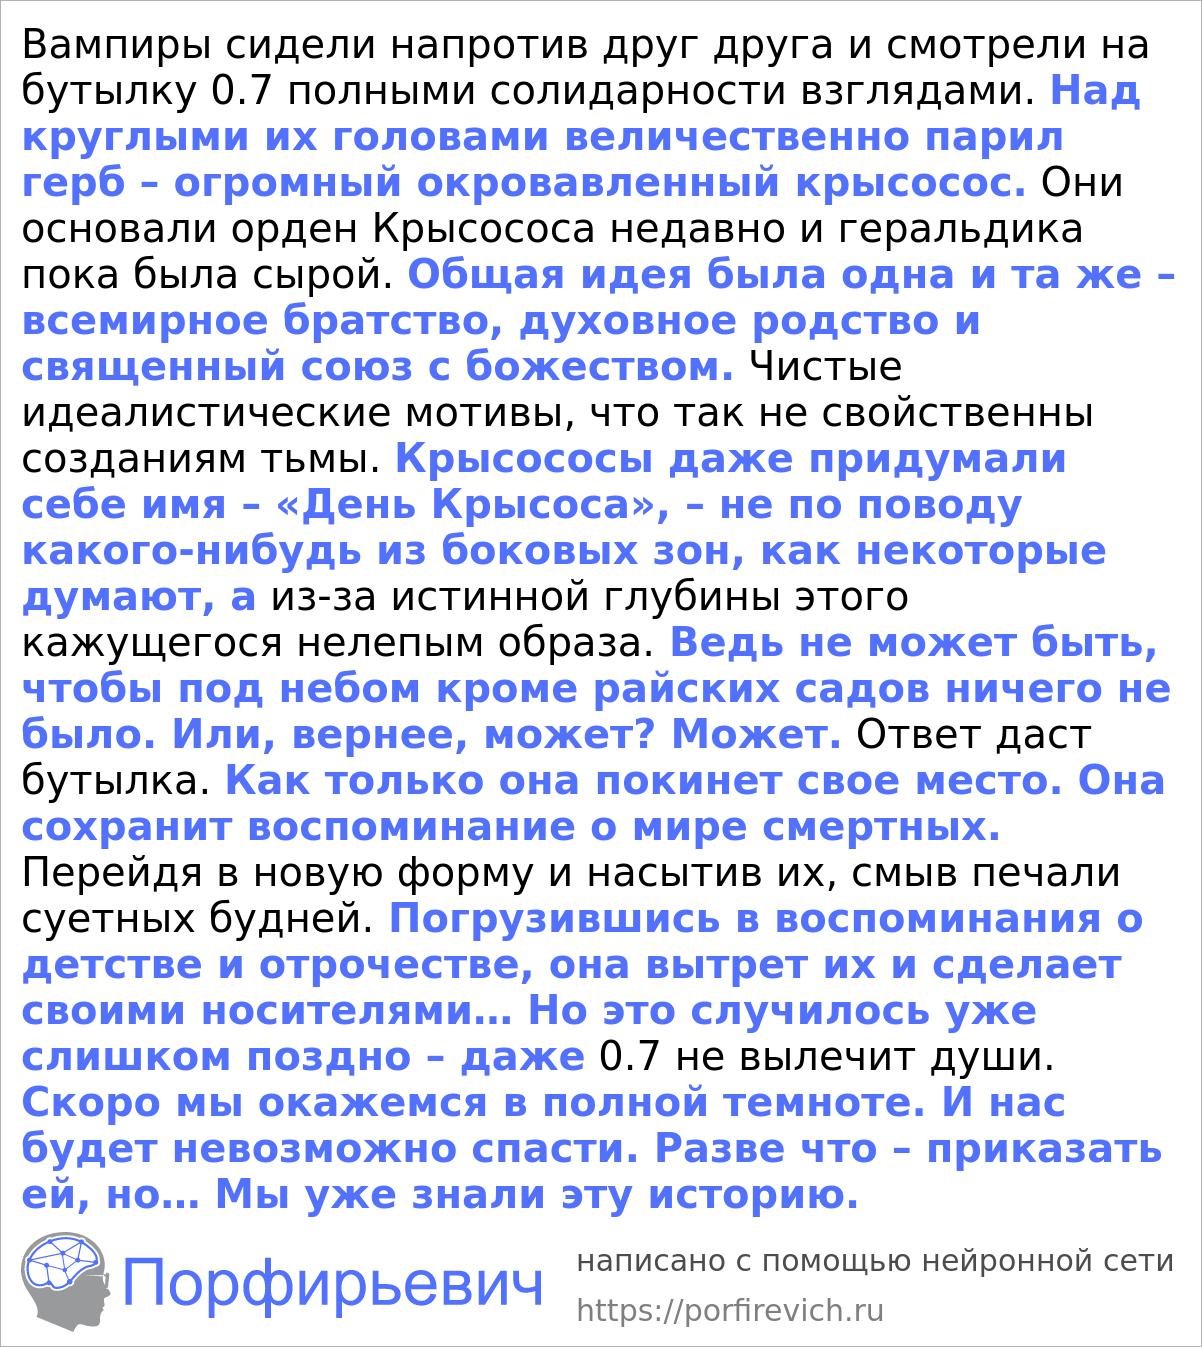 https://porfirevich.ru/media/Jq8vJoOrs.png